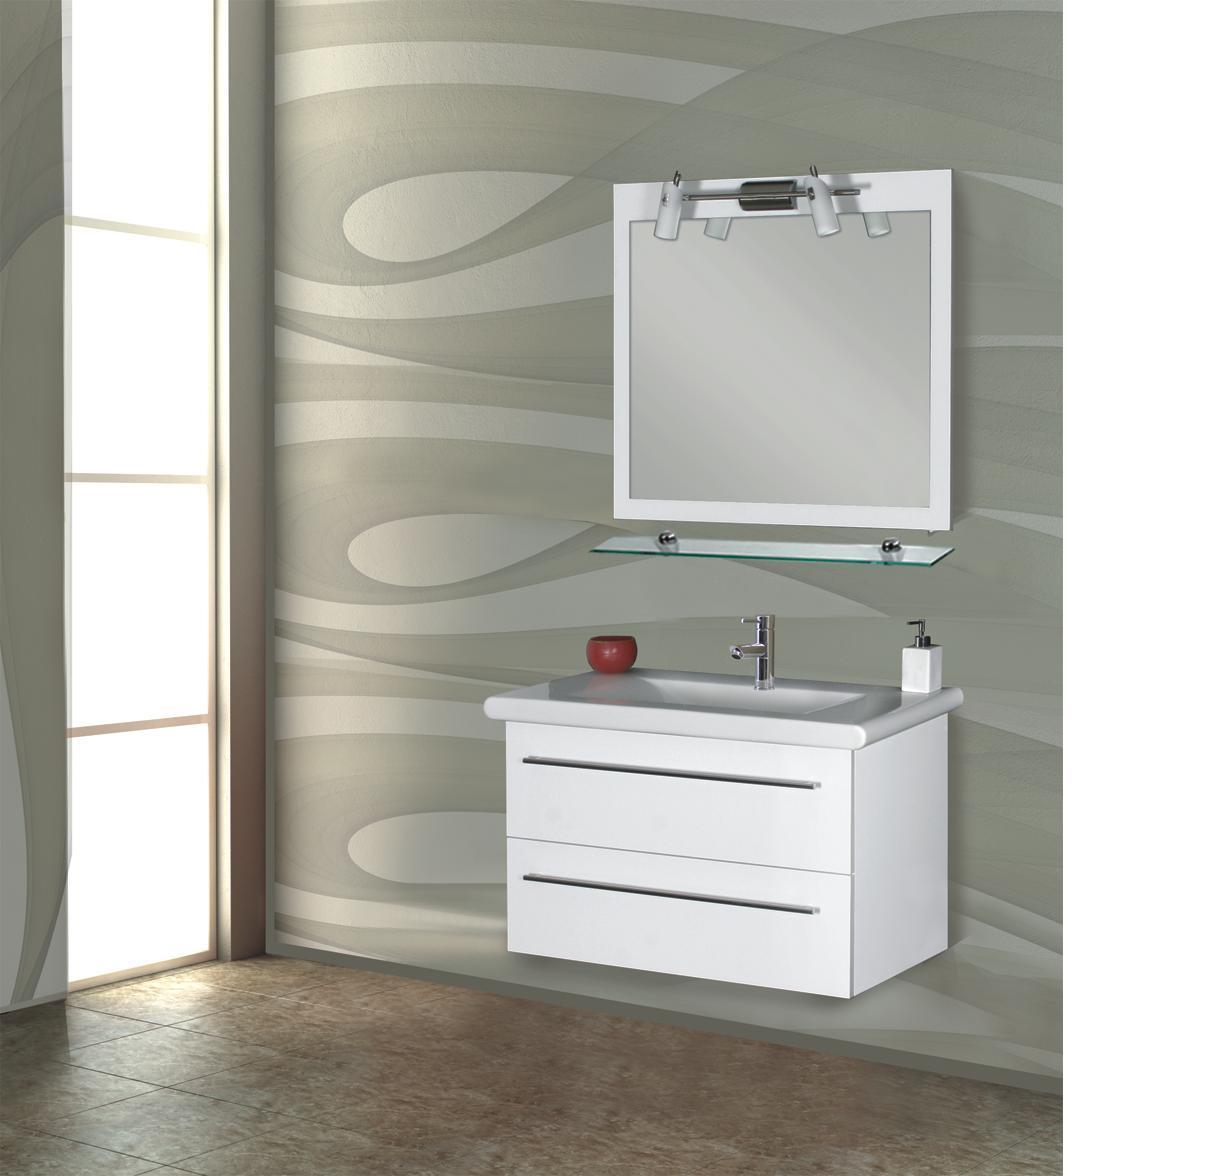 Ensemble pour salle de bain design 100 0 500 0 pi ces for Ensemble de salle de bain